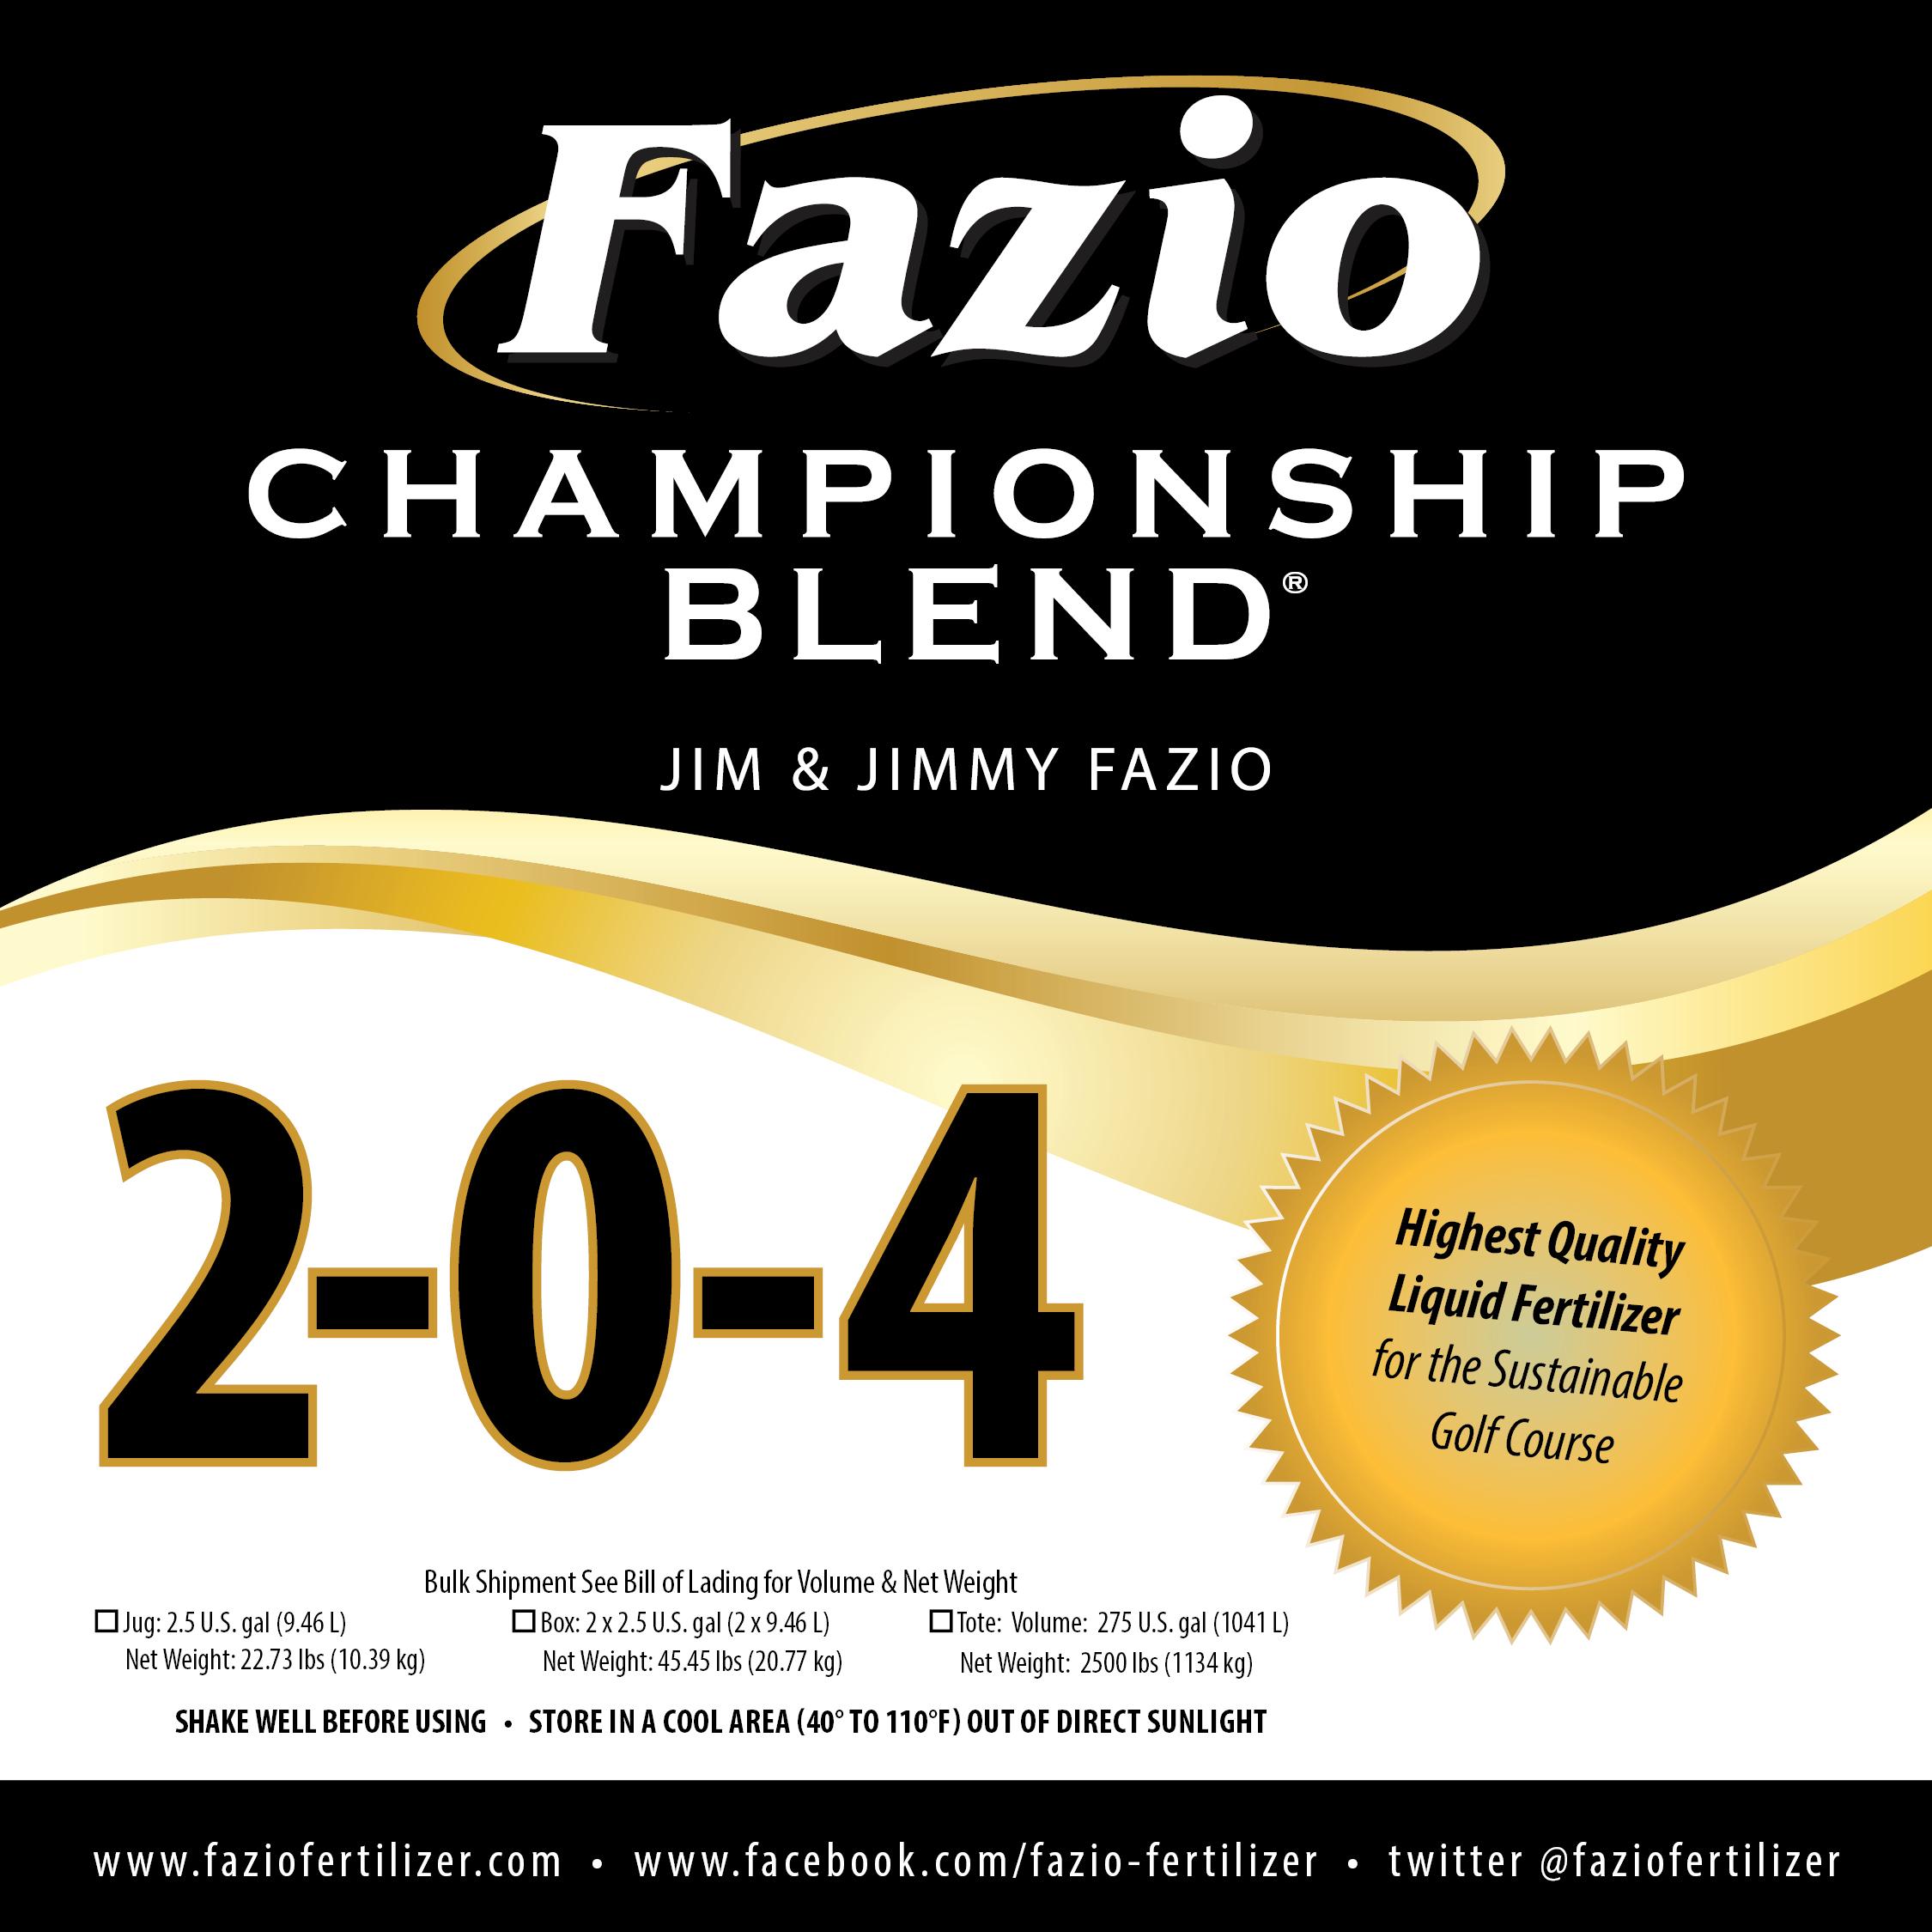 Fazio Championship Blend 2-0-4